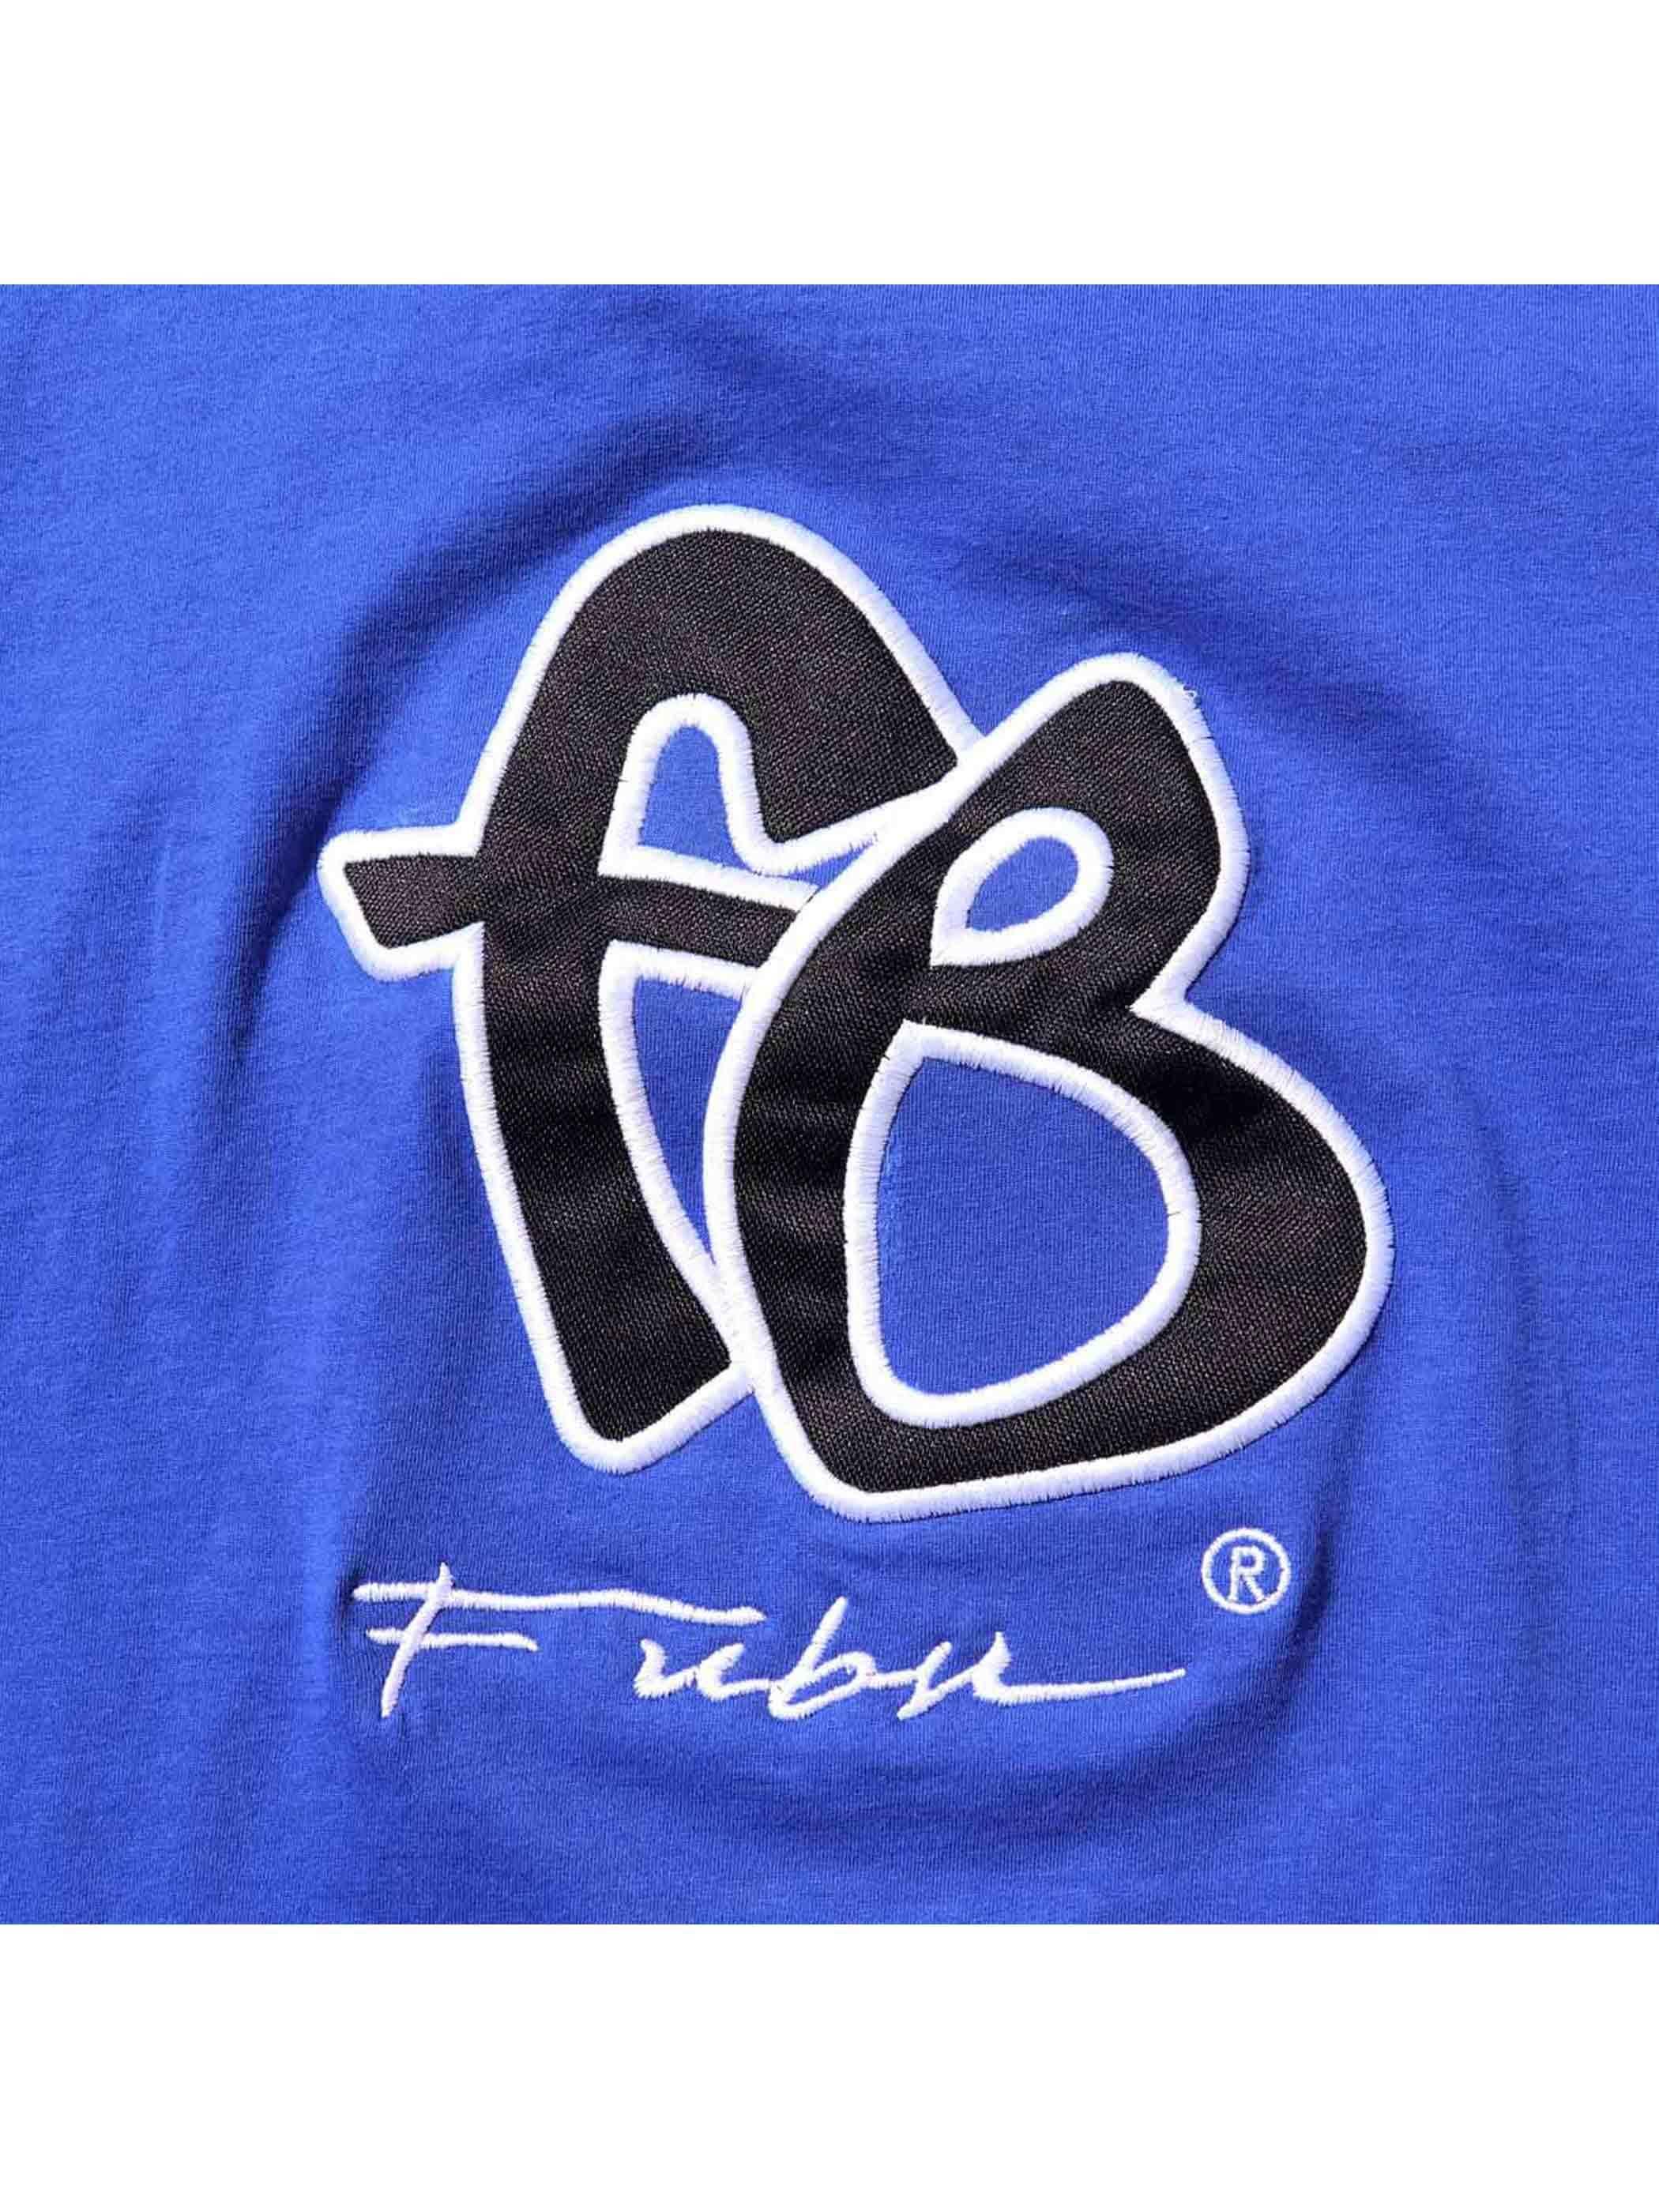 00's ブート FUBU FB刺繍ロゴ Tシャツ [About M]